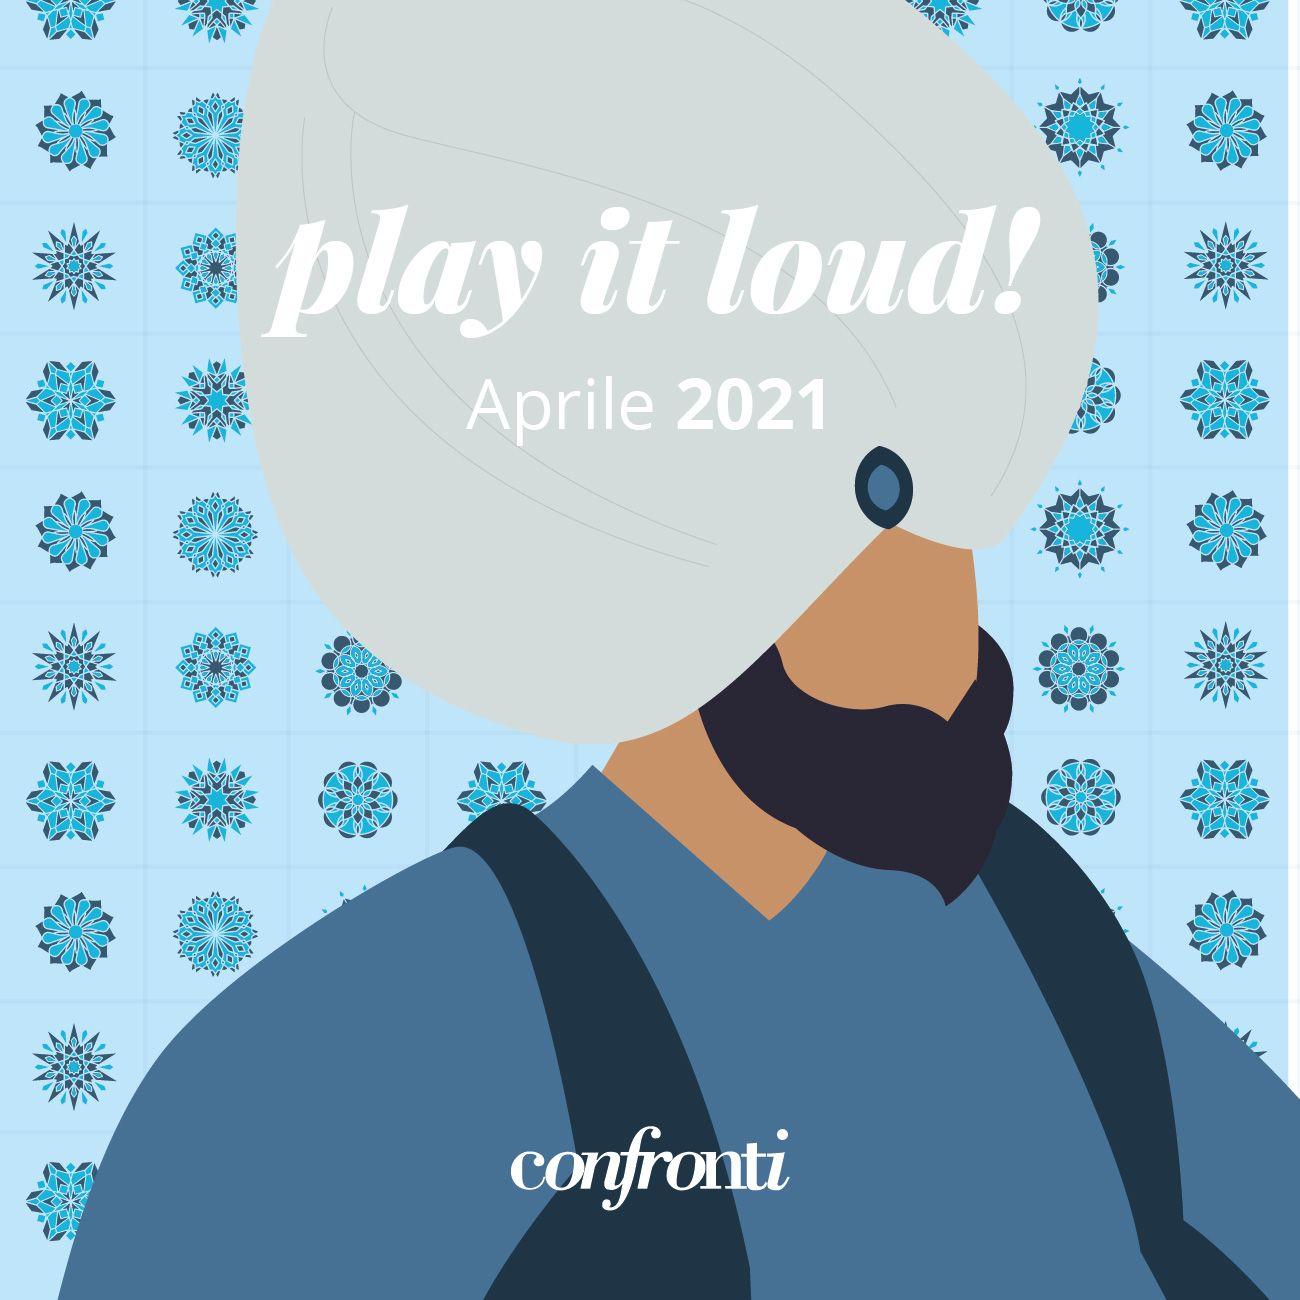 La playlist del mese